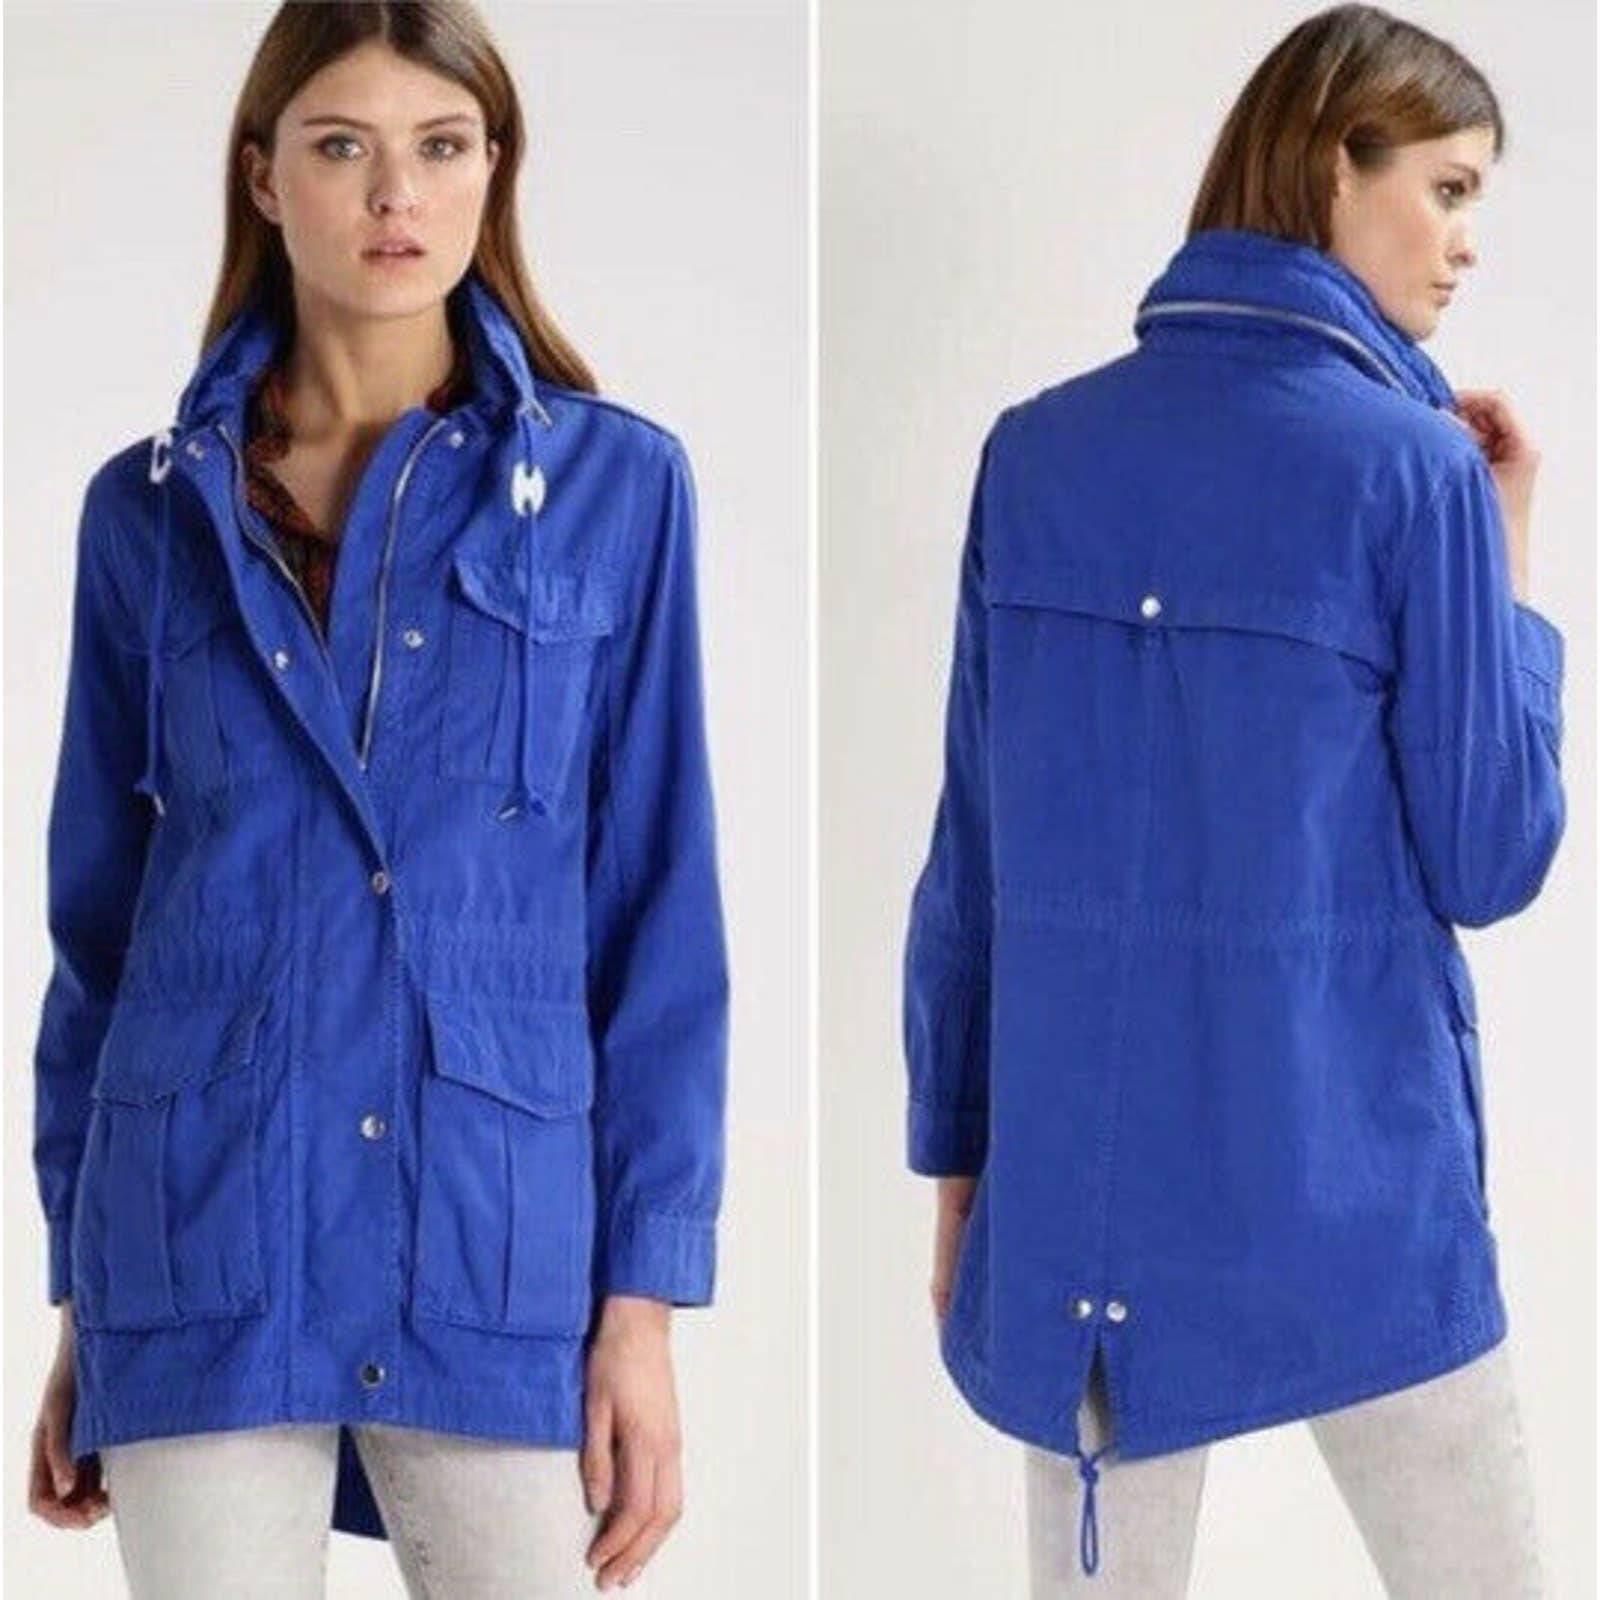 J.Crew Fatigue jacket blue military